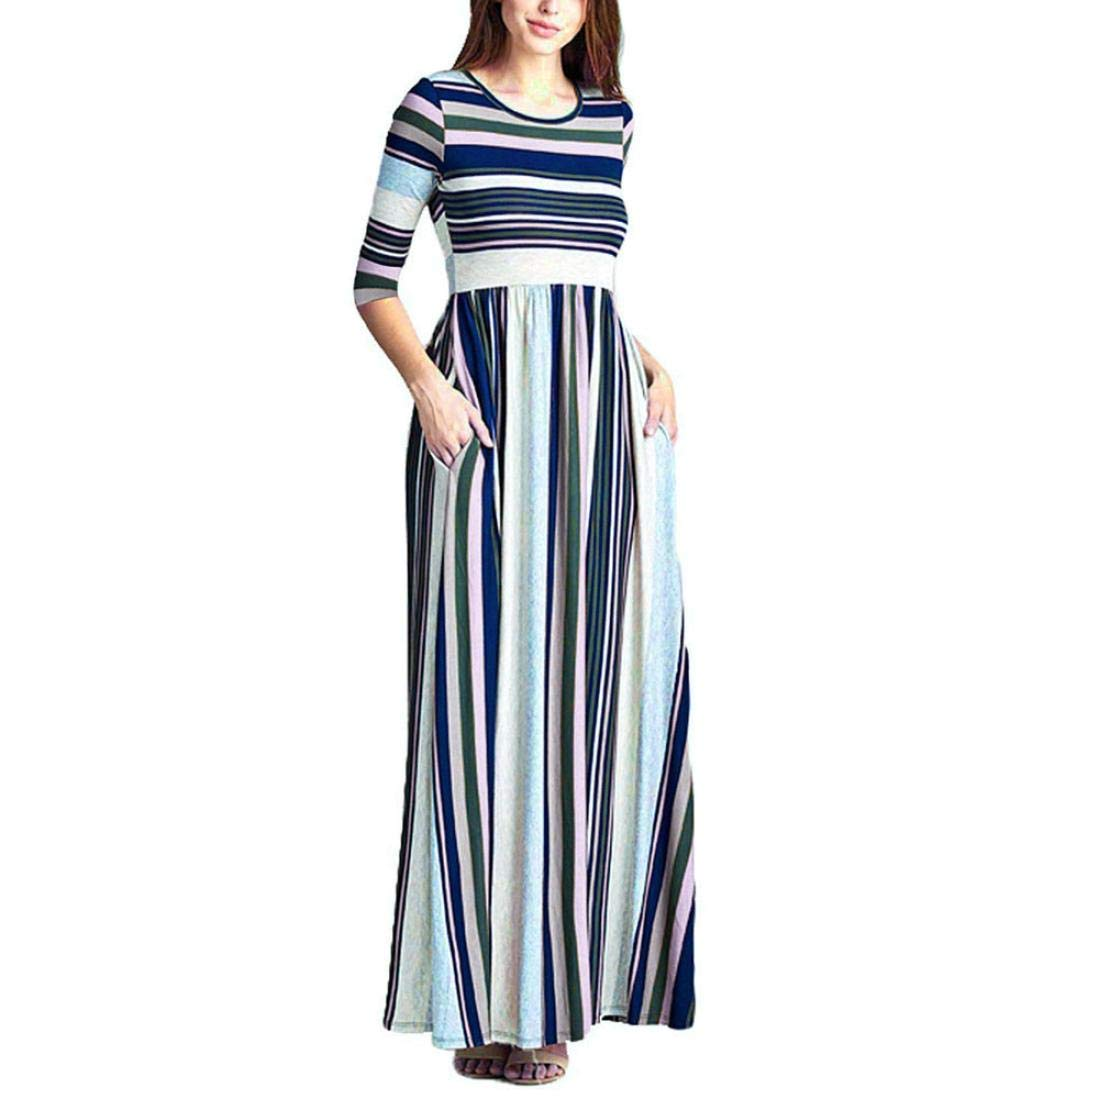 Women Dress,Dainzuy Casual Three Quarter Sleeve Stripe Elastic Waist Pocket Party Dress